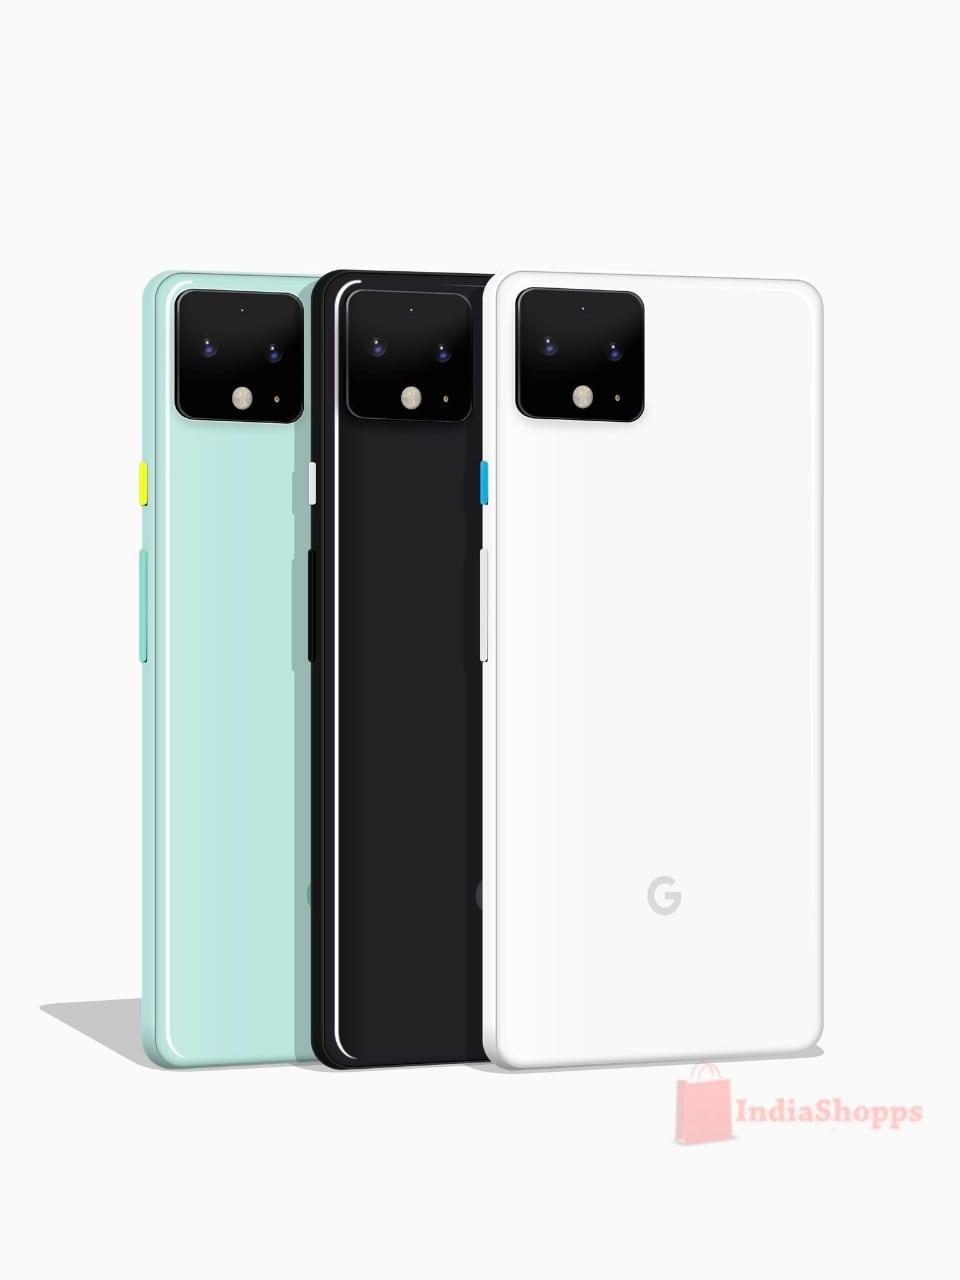 google pixel 4 mint green (4)